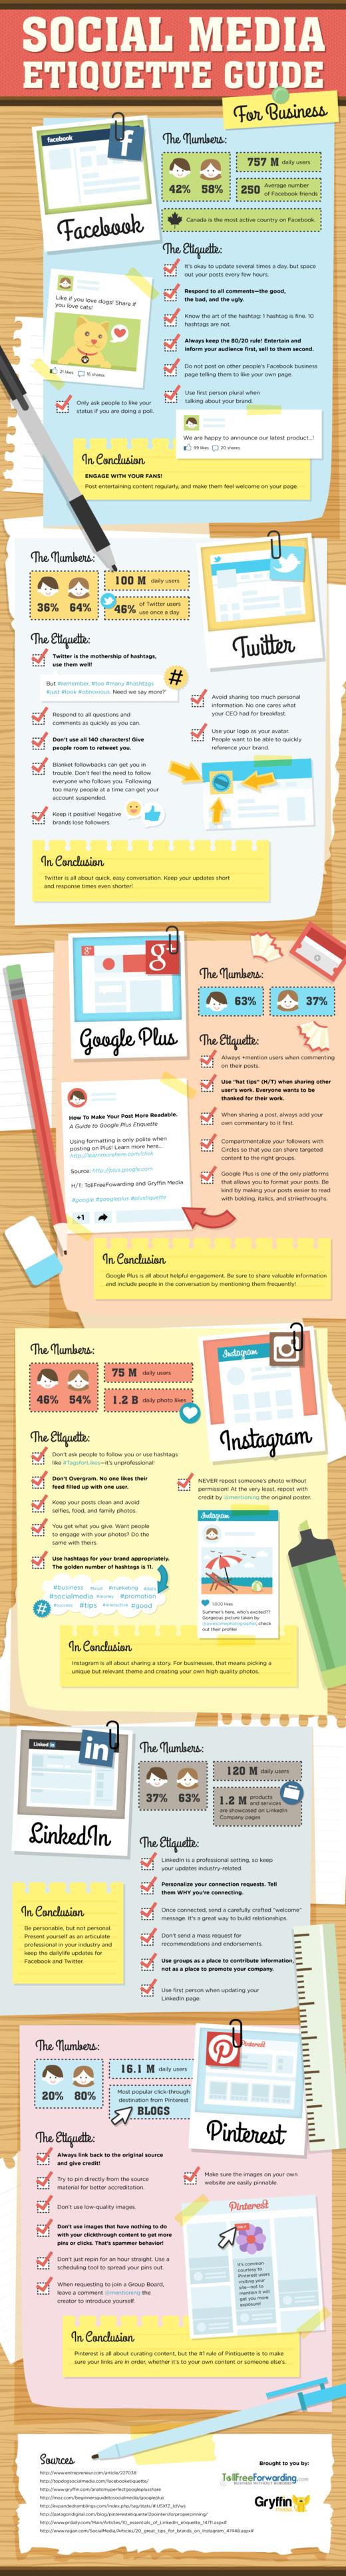 Social media etiquette infographic